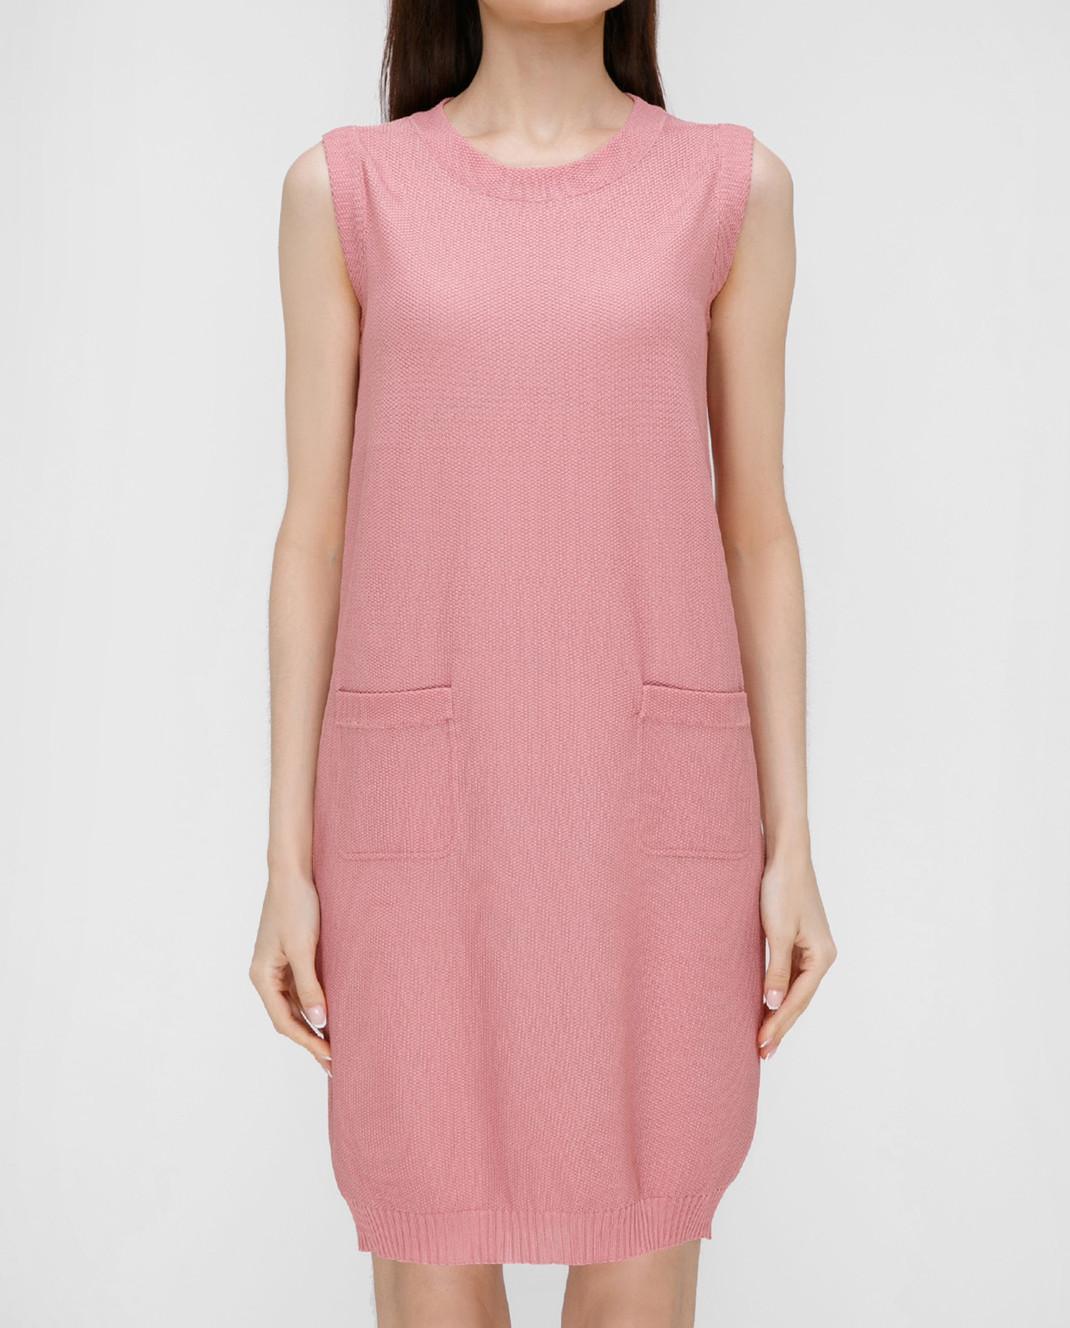 Antonella Creazioni Розовое платье 12260 изображение 3